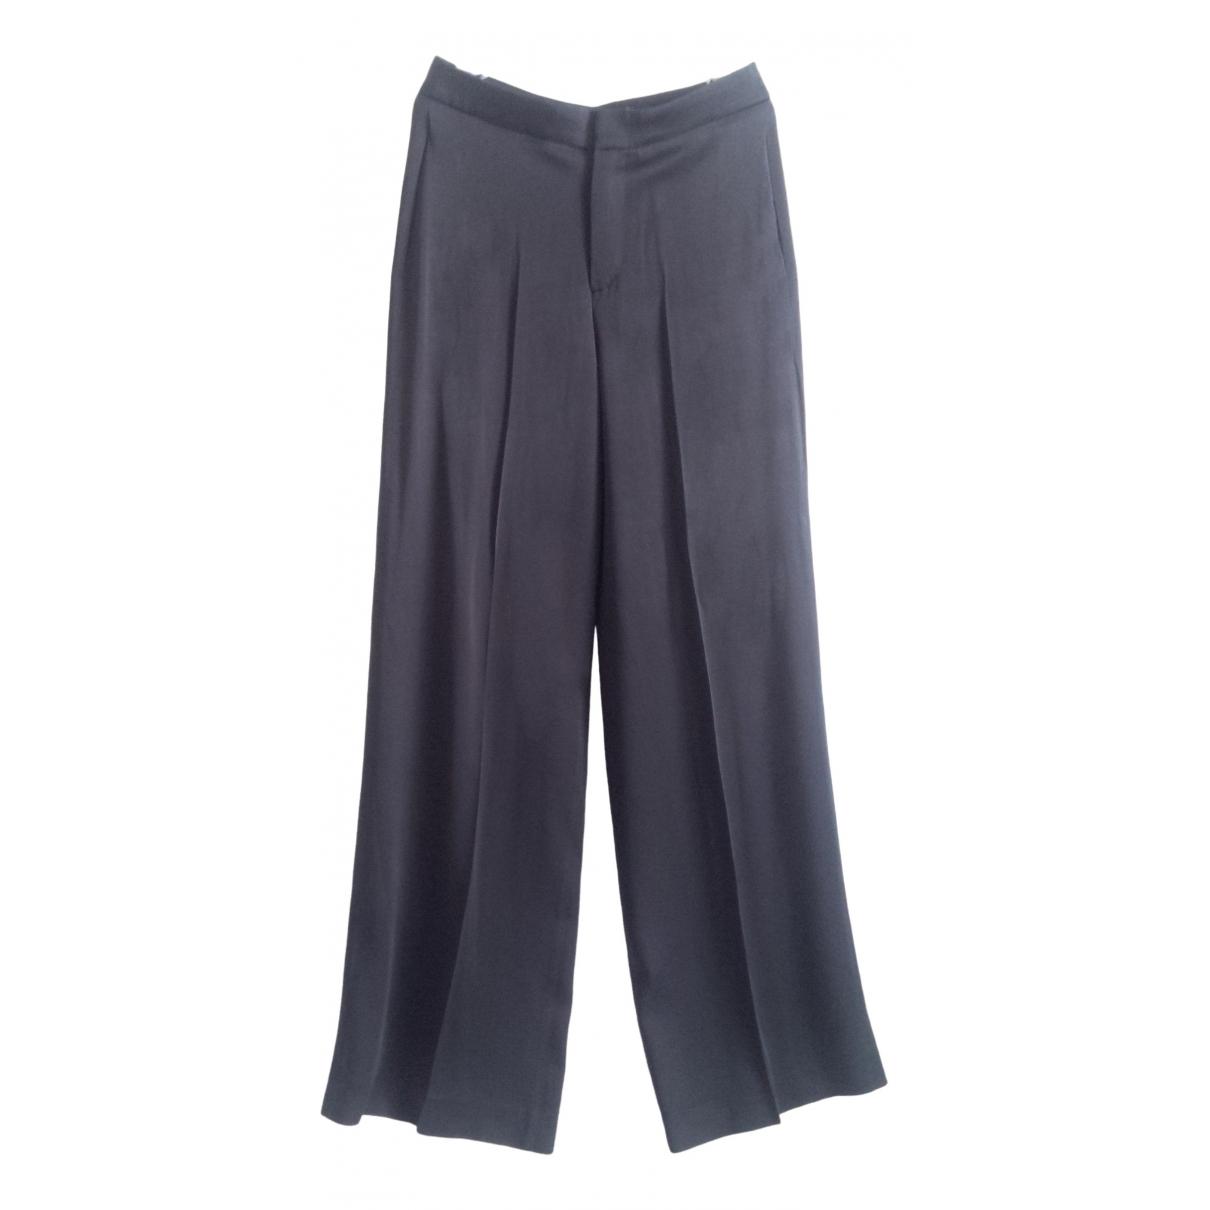 Zara \N Navy Trousers for Women XS International